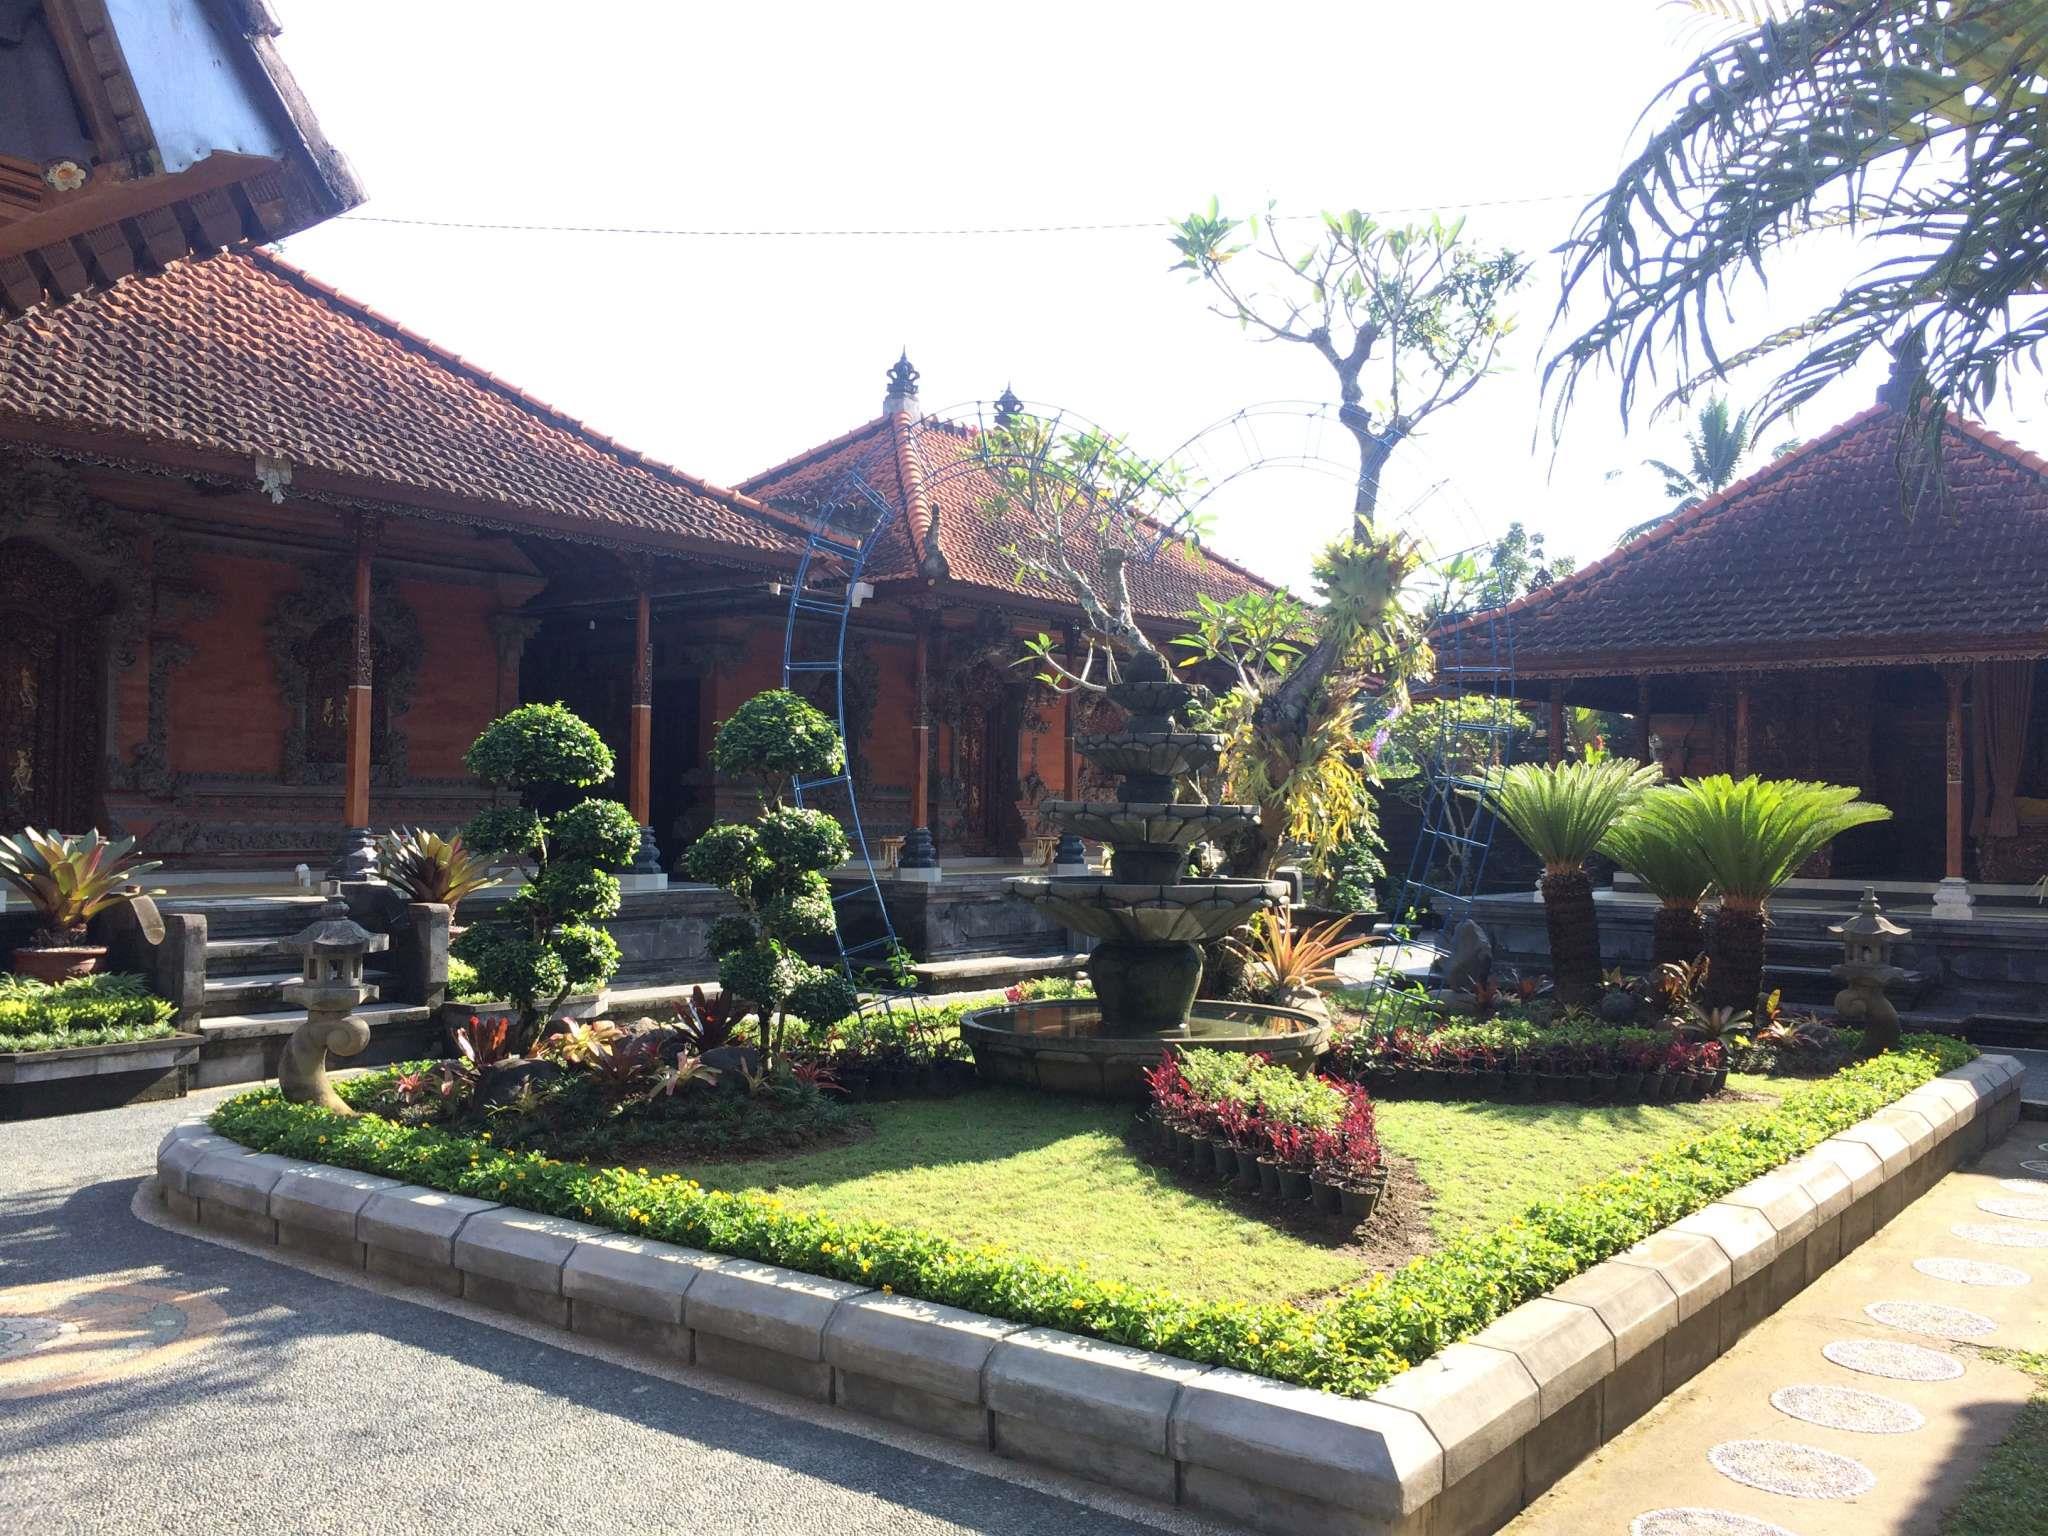 Rumah Bali Luwus ホテル詳細